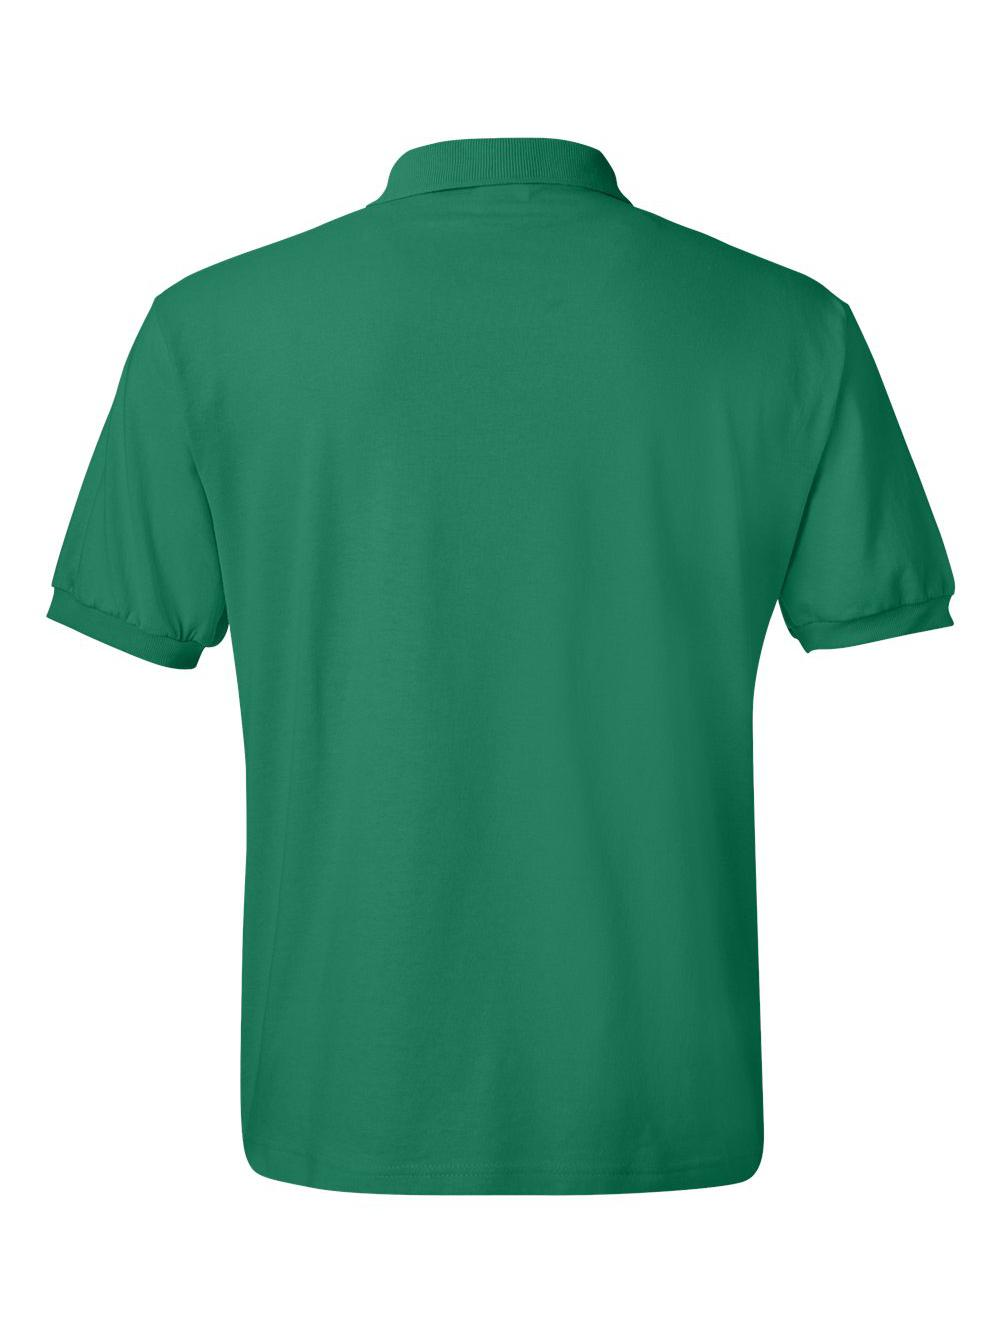 Hanes-Ecosmart-Jersey-Sport-Shirt-054X thumbnail 22